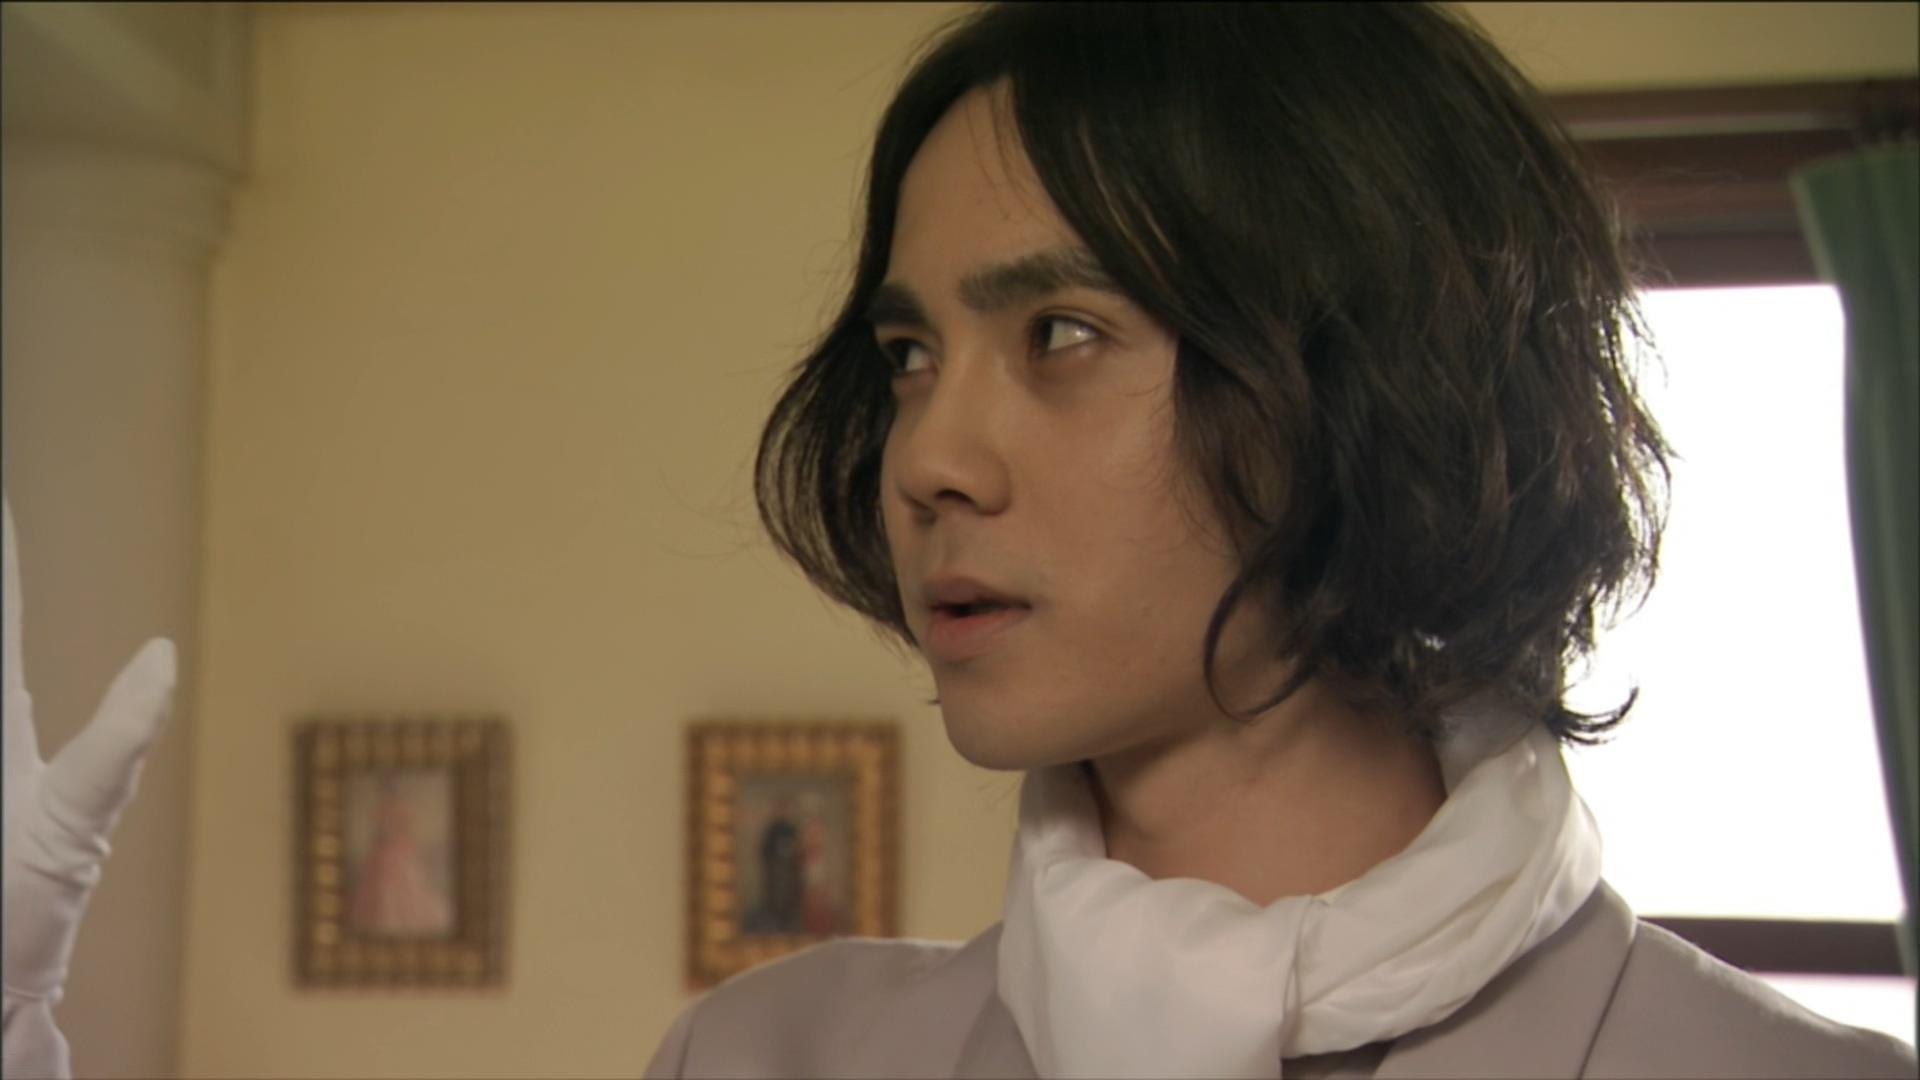 Ryo Itoya (A.R. World)